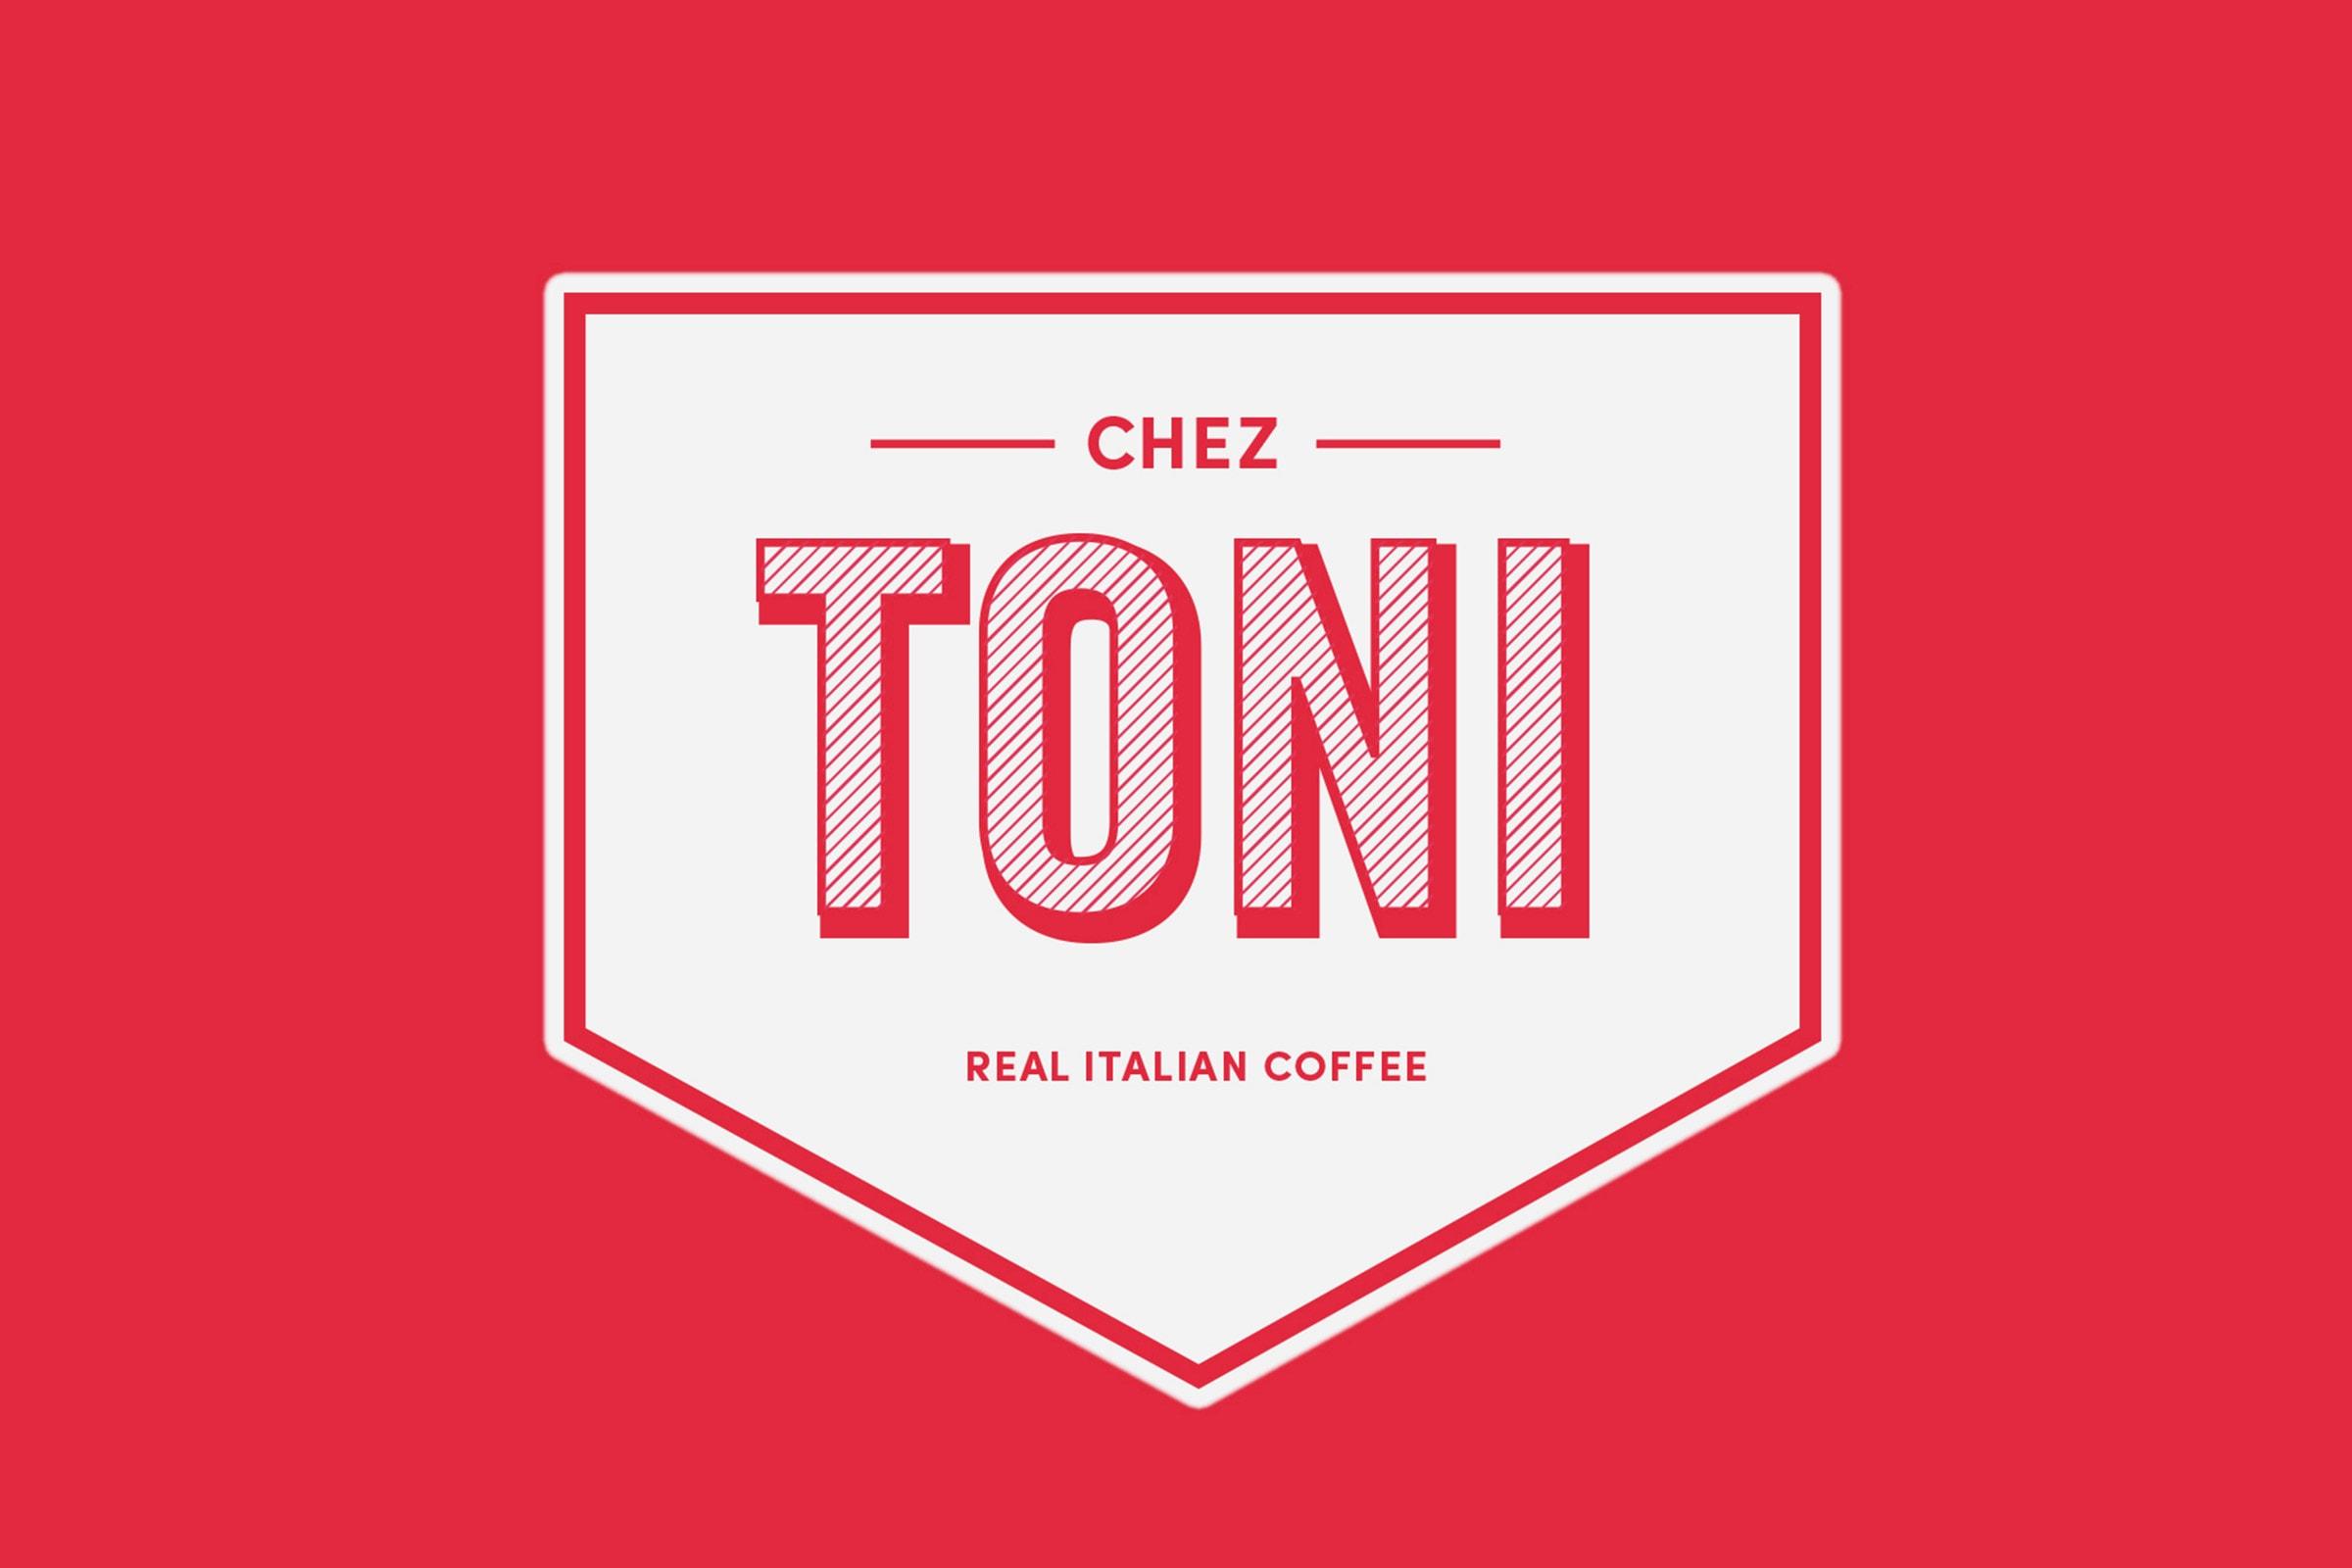 chez toni, speisekarte, vodafone, vodafone campus, düsseldorf, restaurant branding, logo